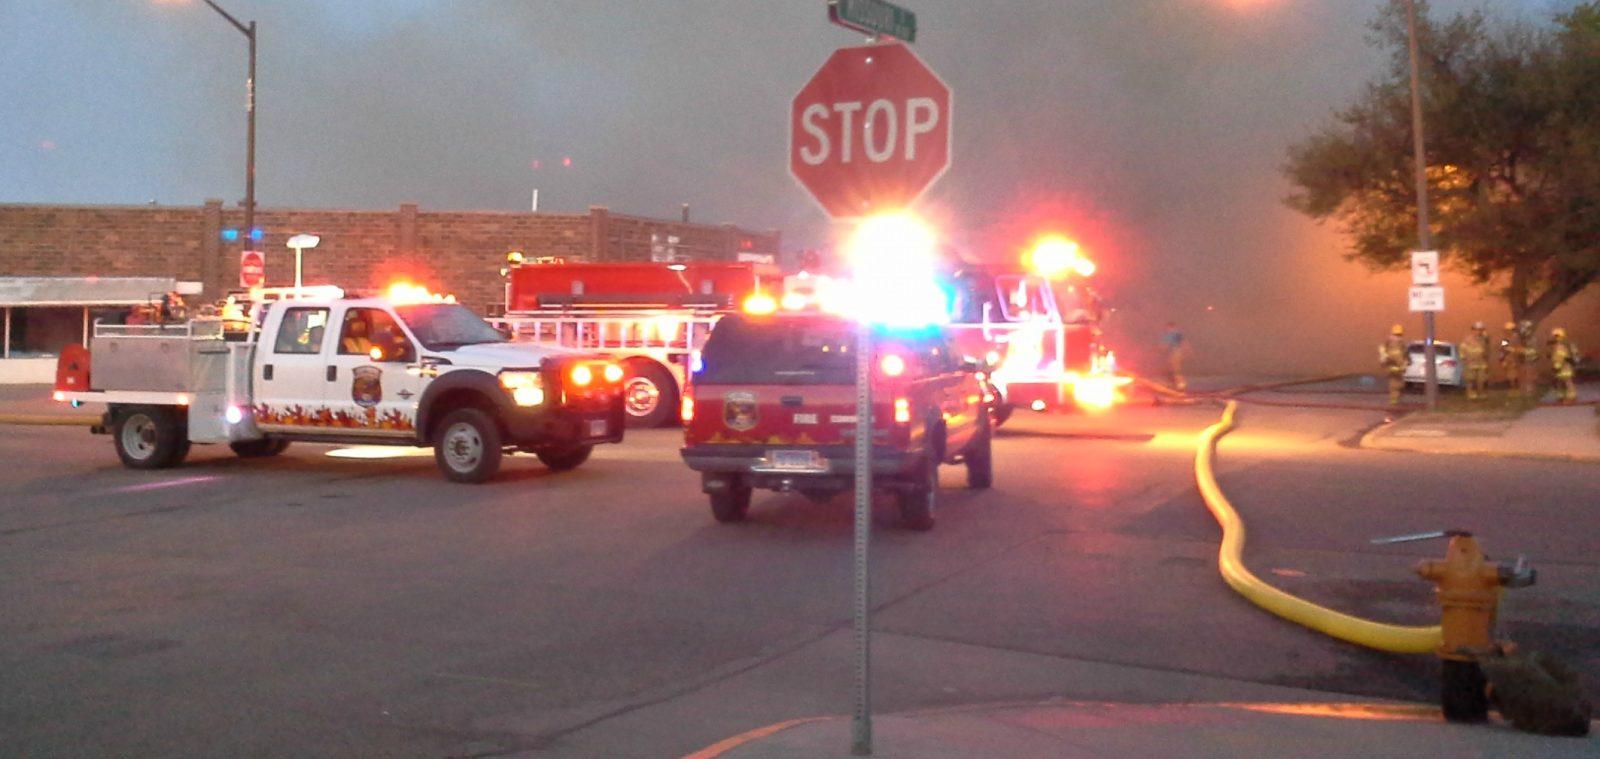 Colorado Camping and emergency preparedness